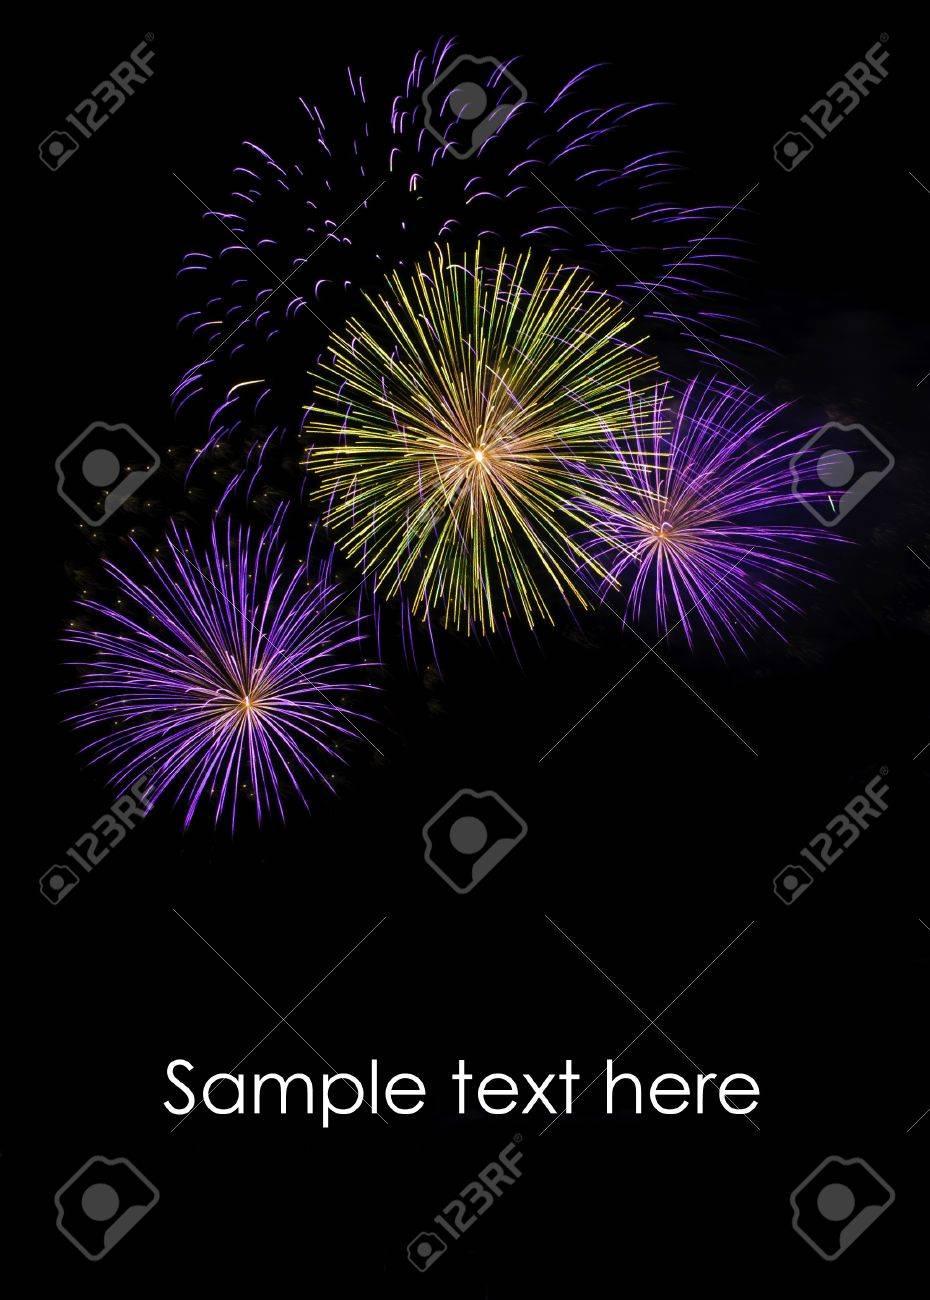 Fireworks at Pattaya beach, Thailand Stock Photo - 8285772